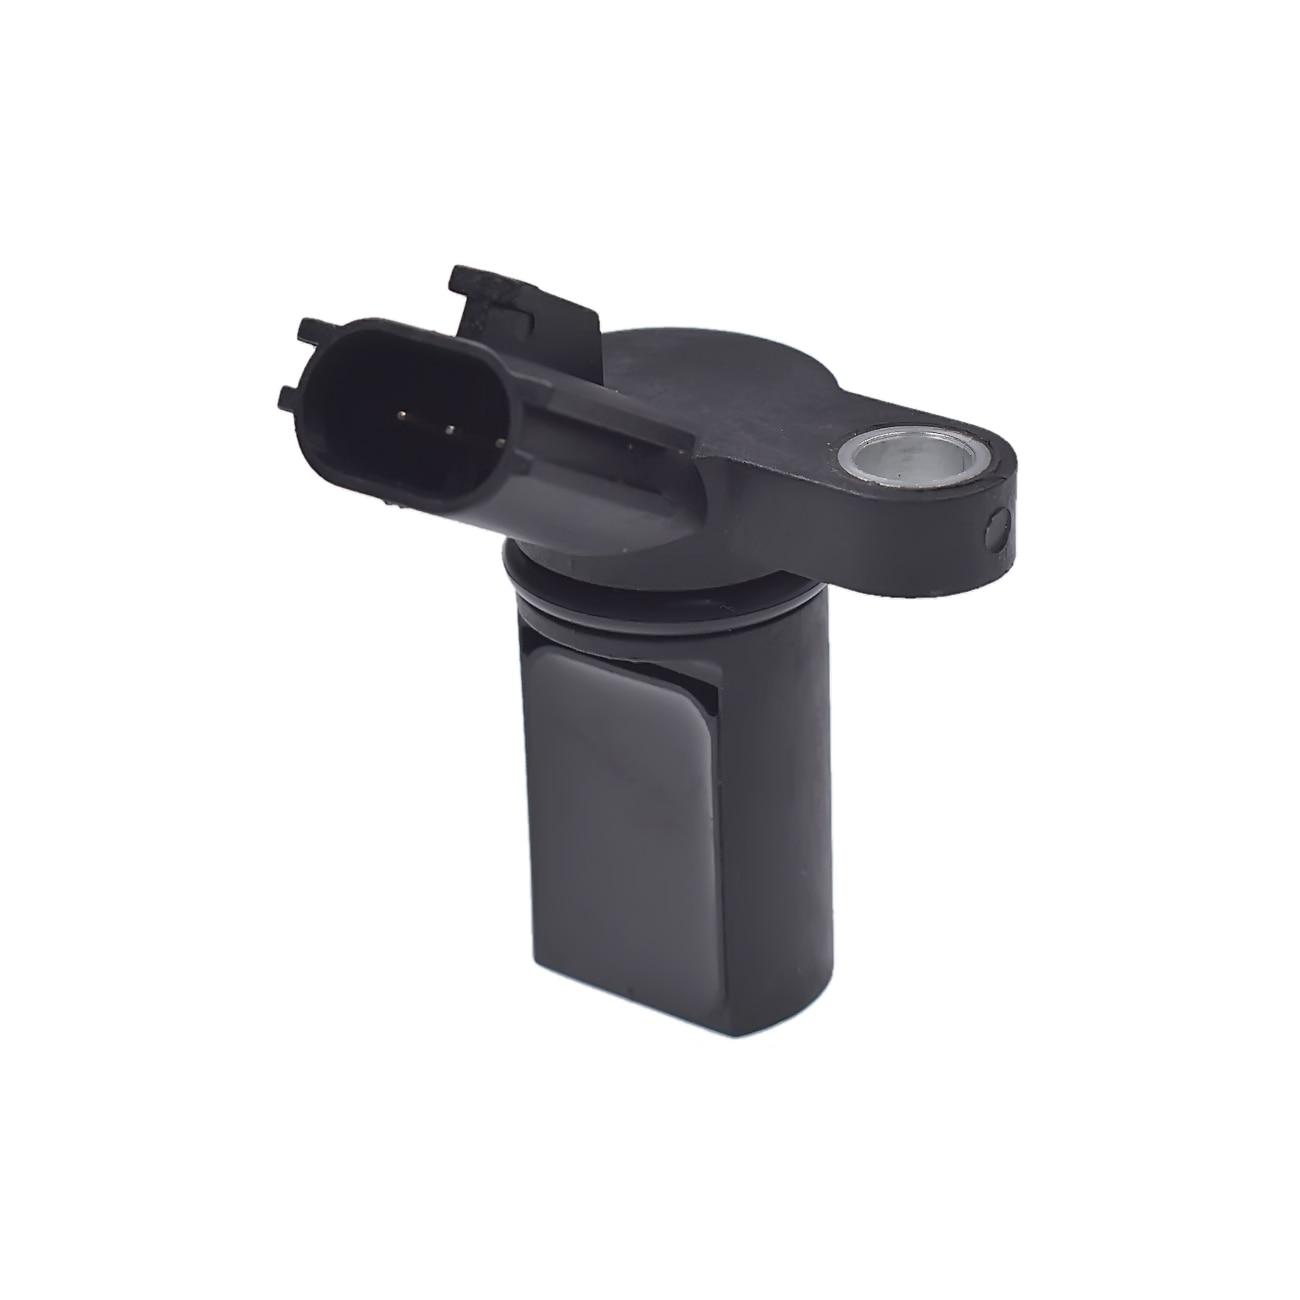 Hot Sale New Camshaft Crankshaft Position Sensor Cps 23731 Al61a For Wiring Harness Nissan Infiniti